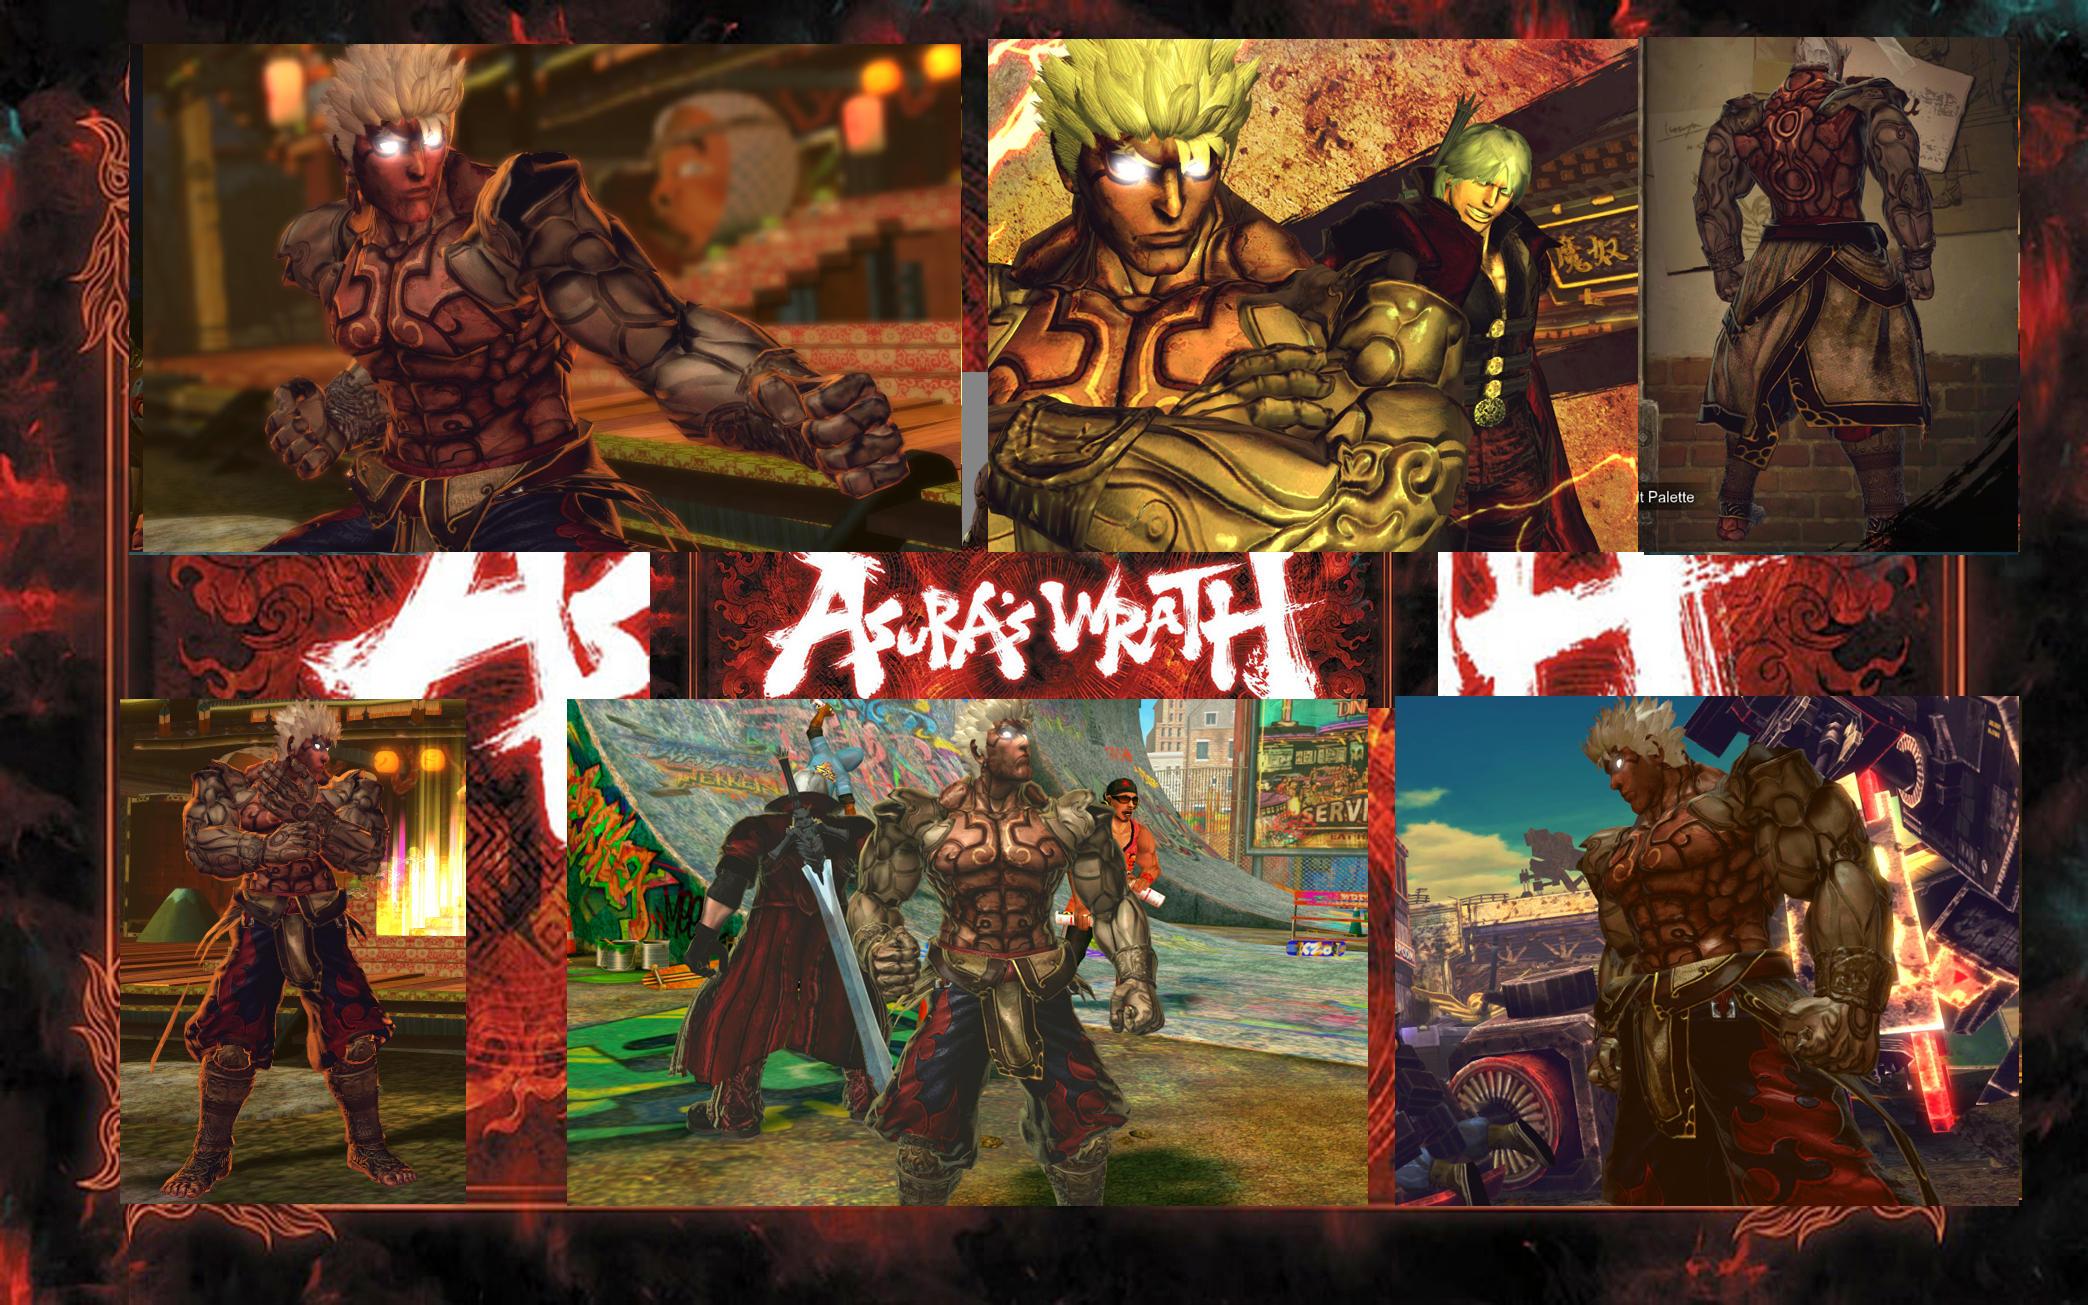 SF X TEKKEN Ryu Asura Wrath Vol 3 by monkeygigabuster